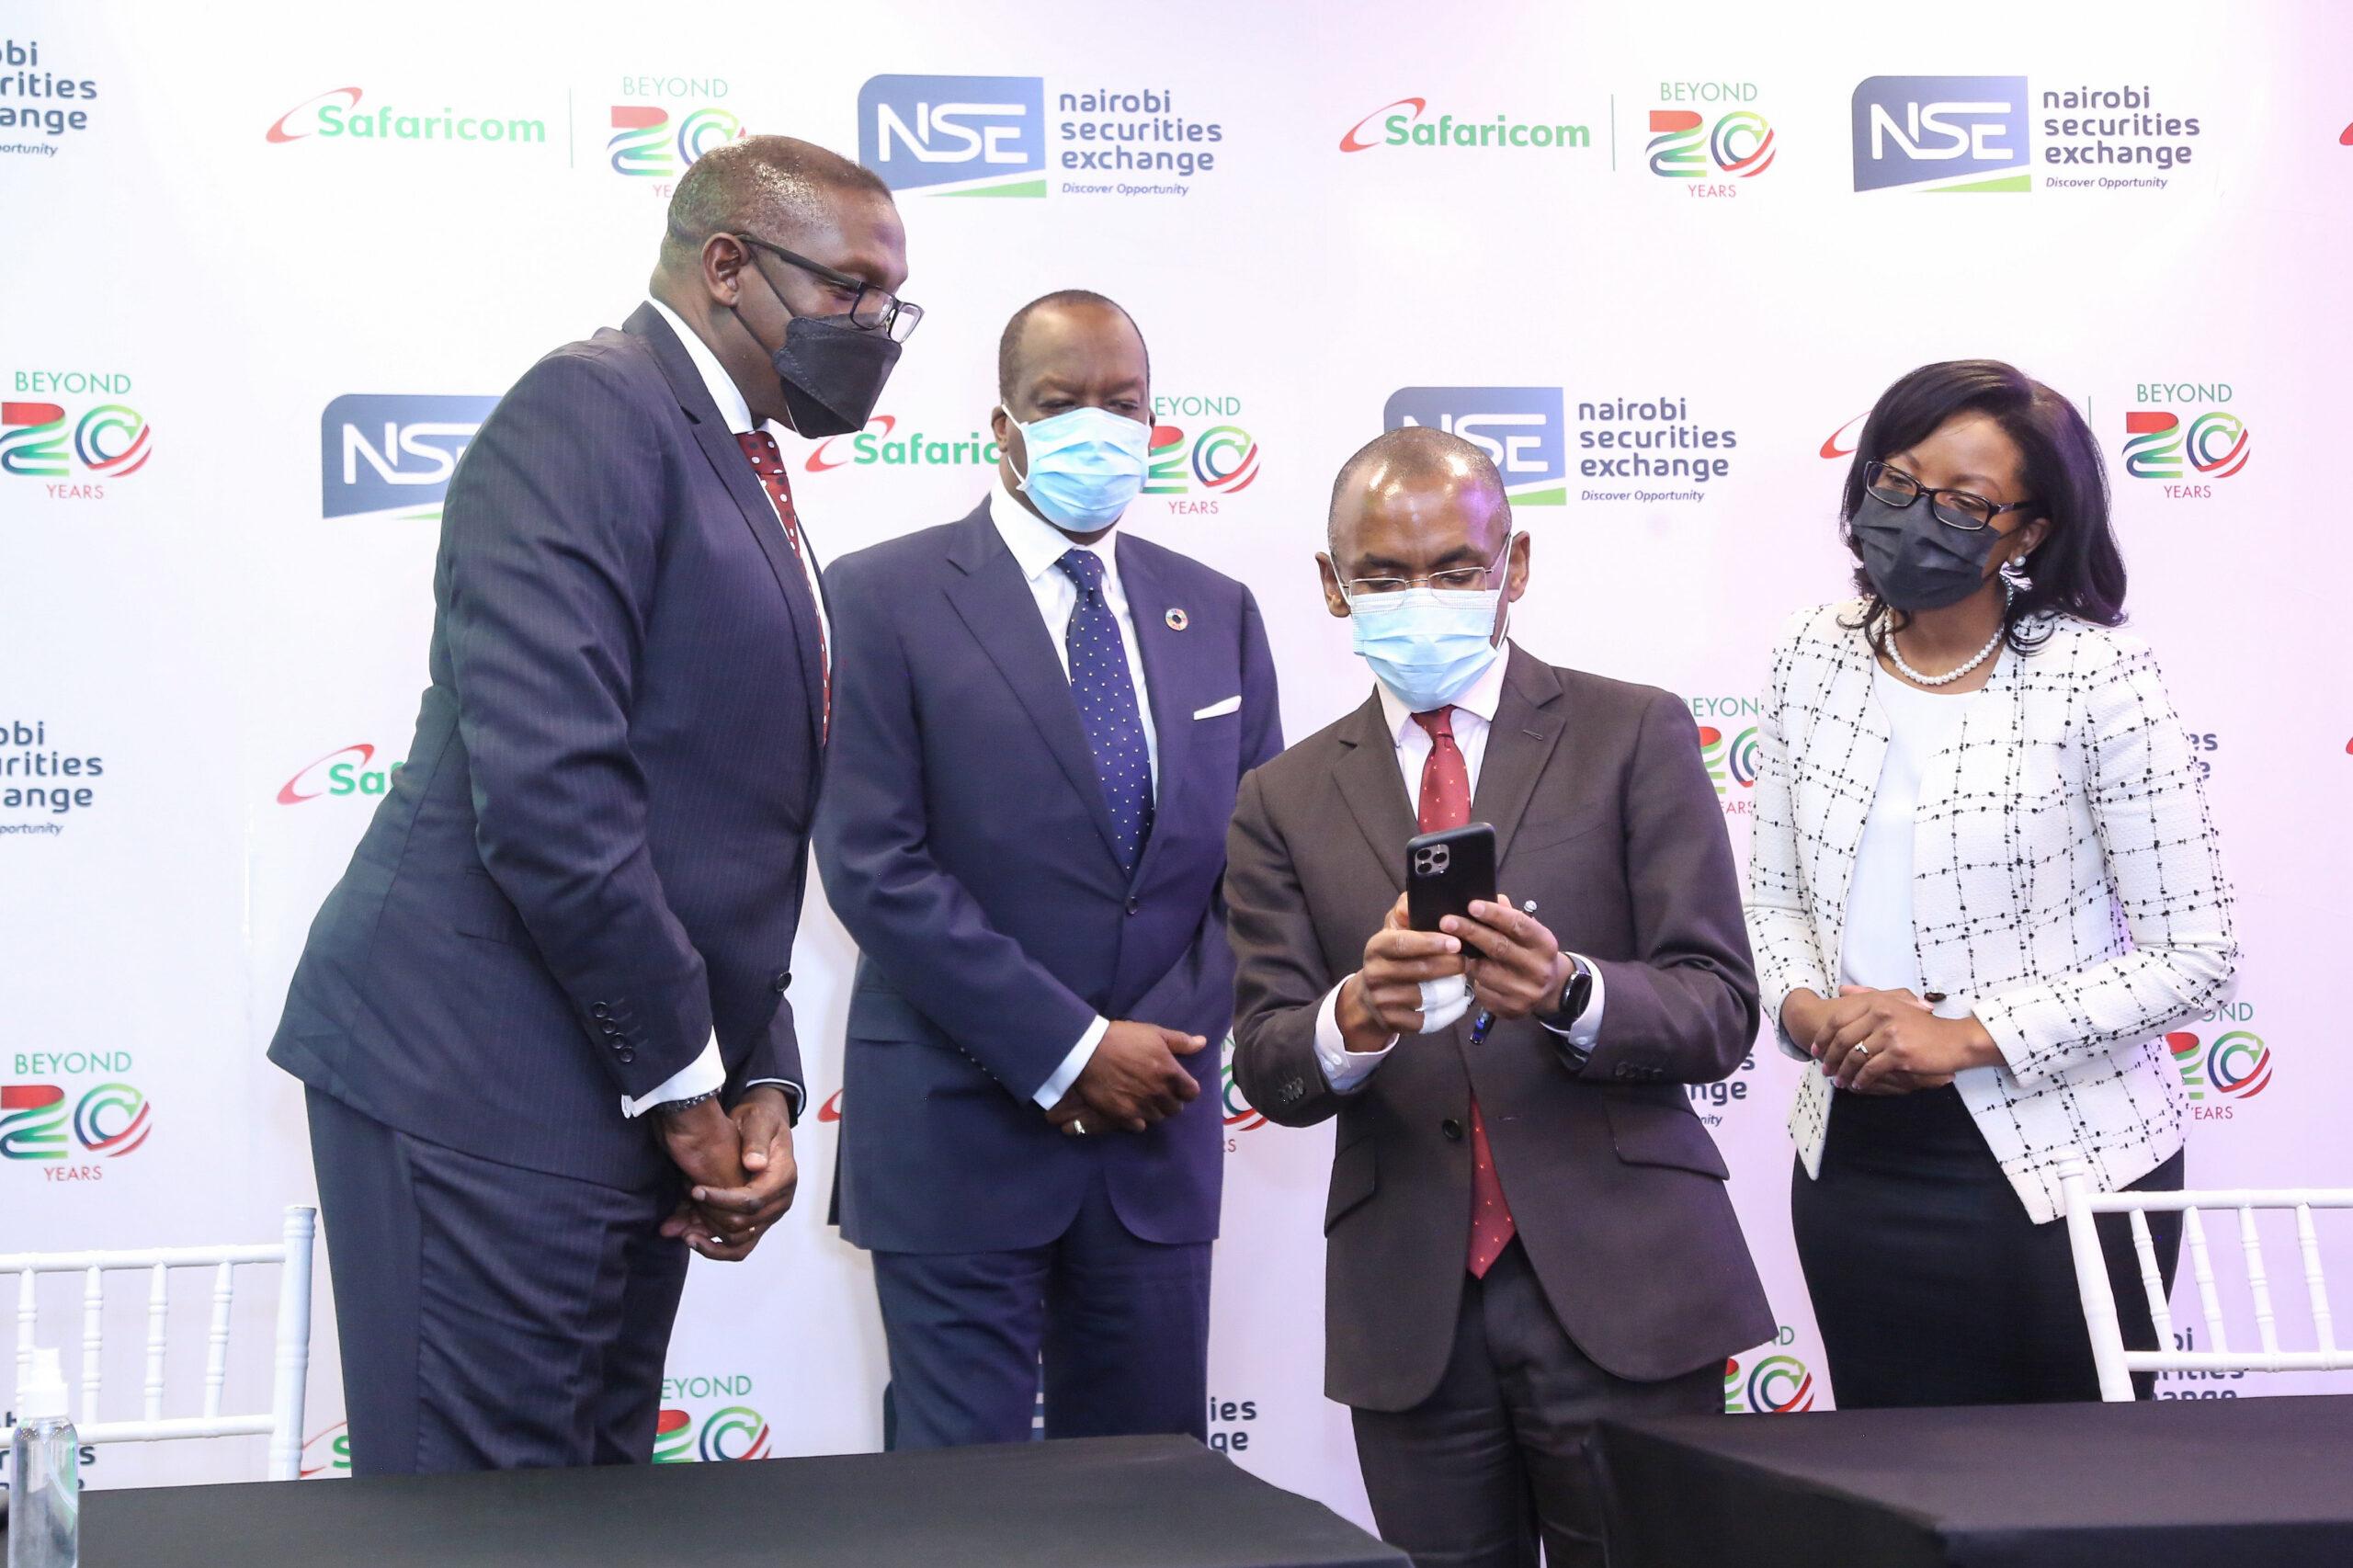 Safaricom Customers to Trade at Nairobi Securities Exchange Using Bonga Points